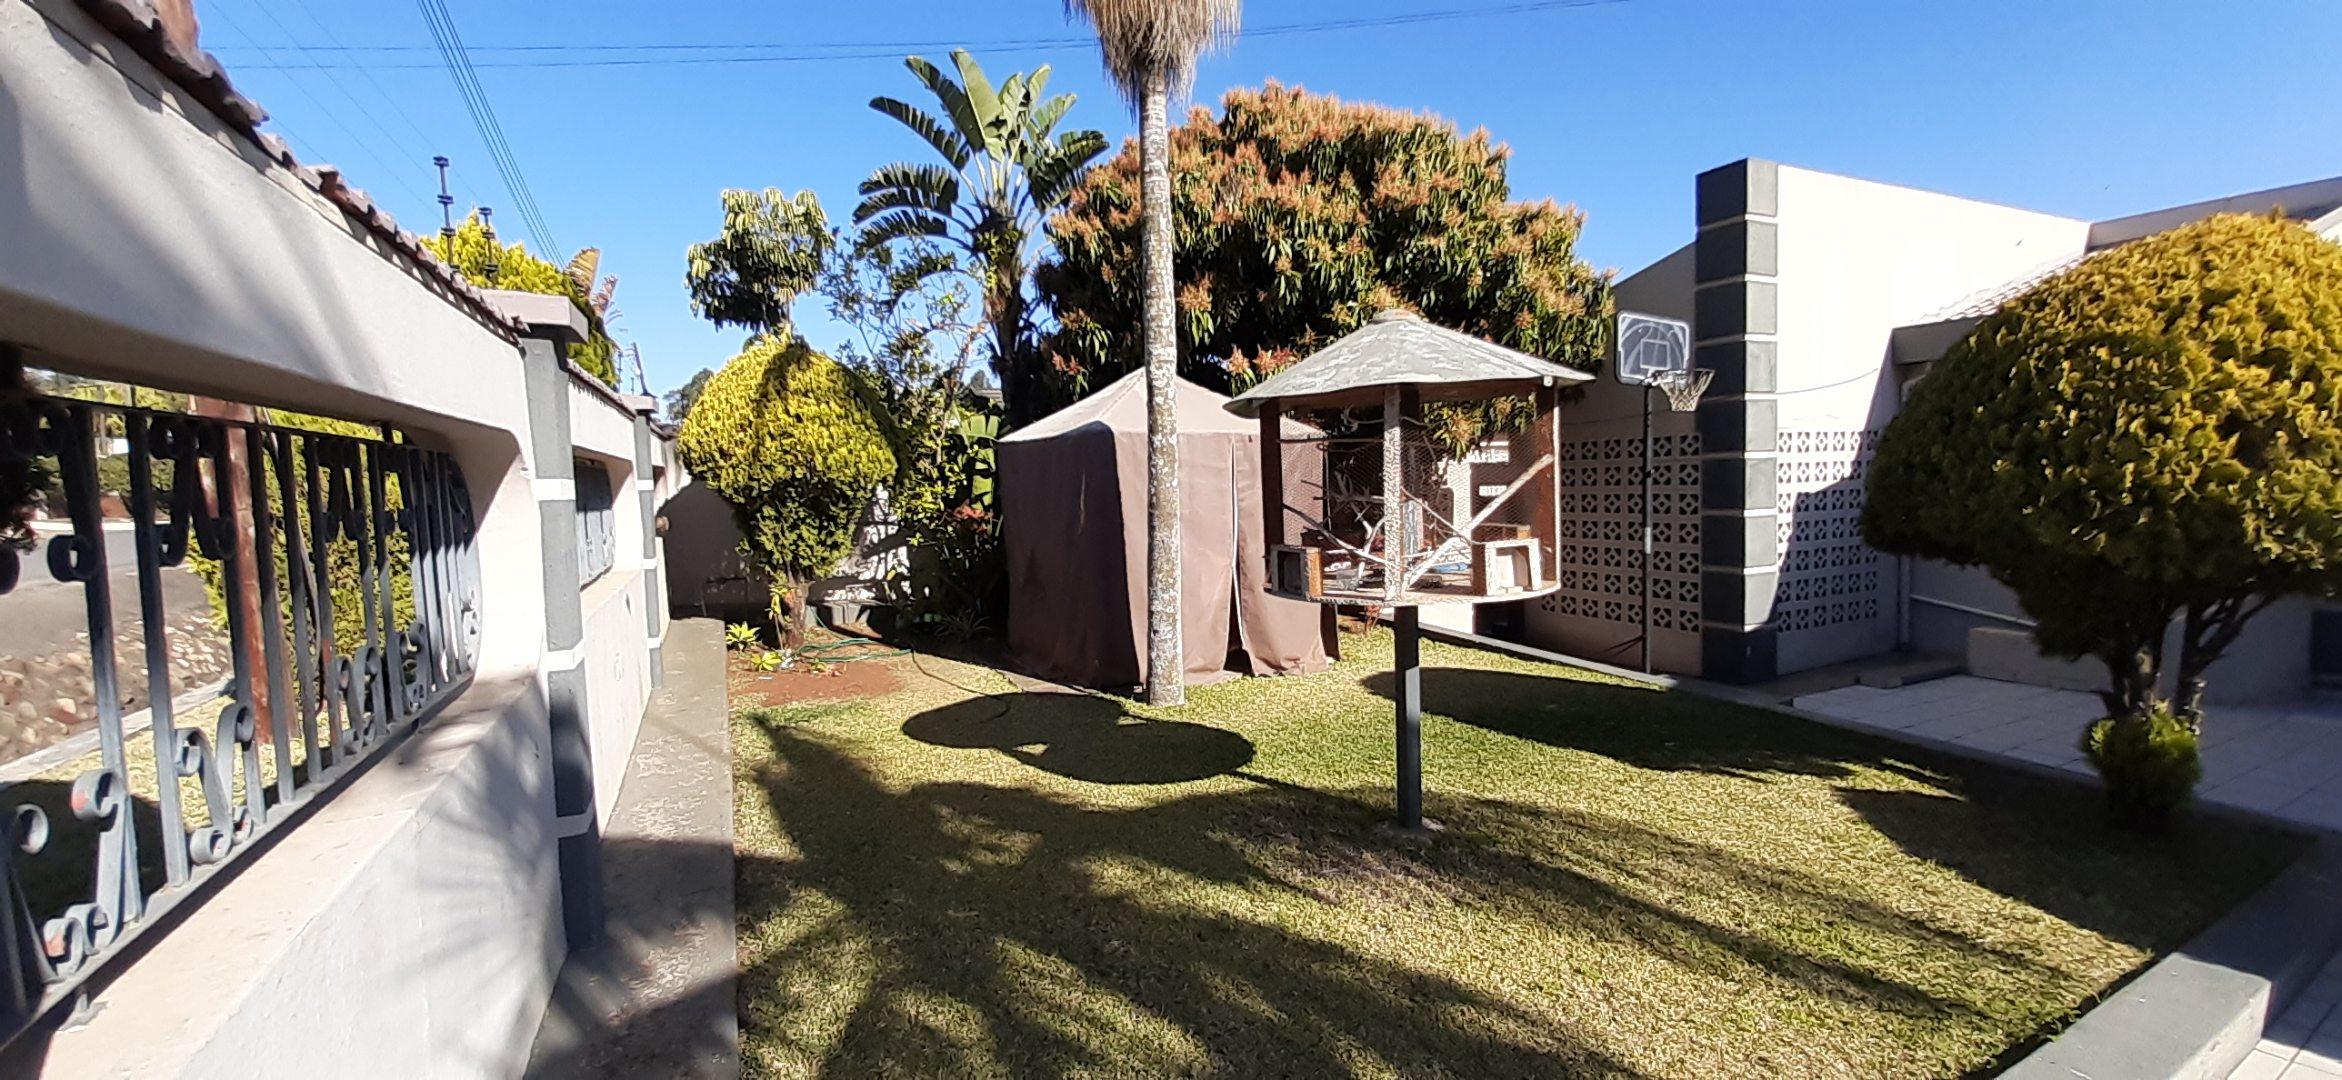 4 Bedroom House For Sale in Manzini